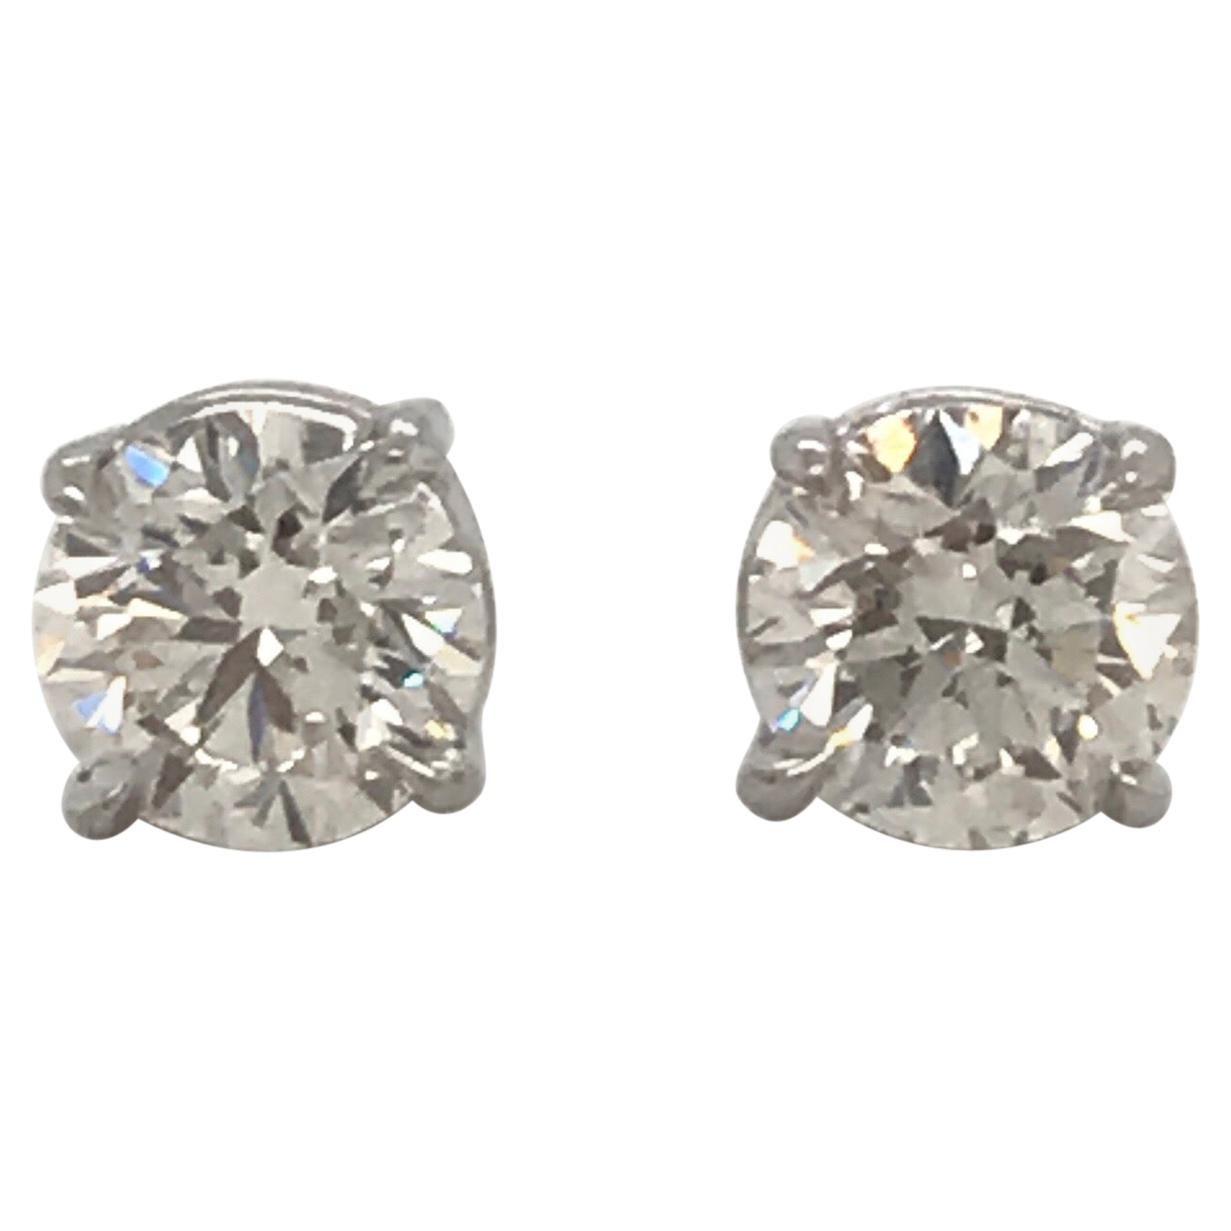 Diamond Stud Earrings 1.90 Carat F SI3-I1 14 Karat White Gold